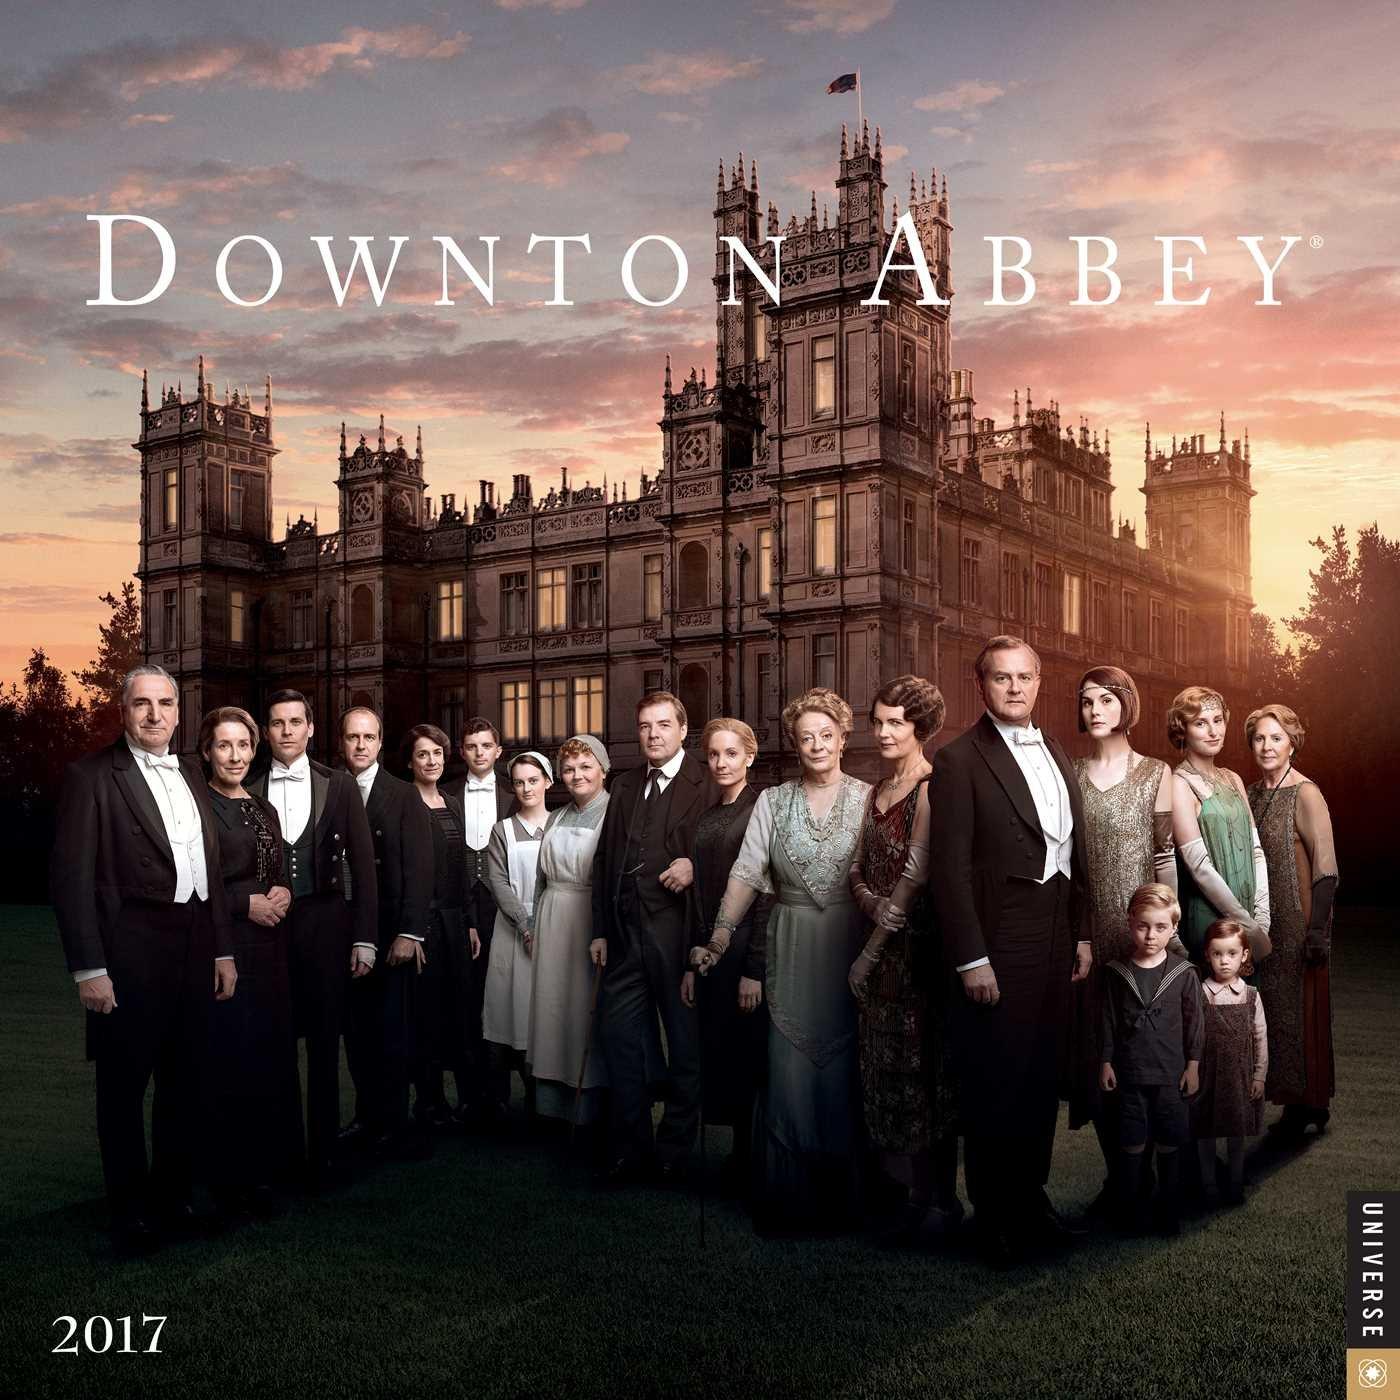 Downton Abbey 2017 Wall Calendar by Universe Publishing